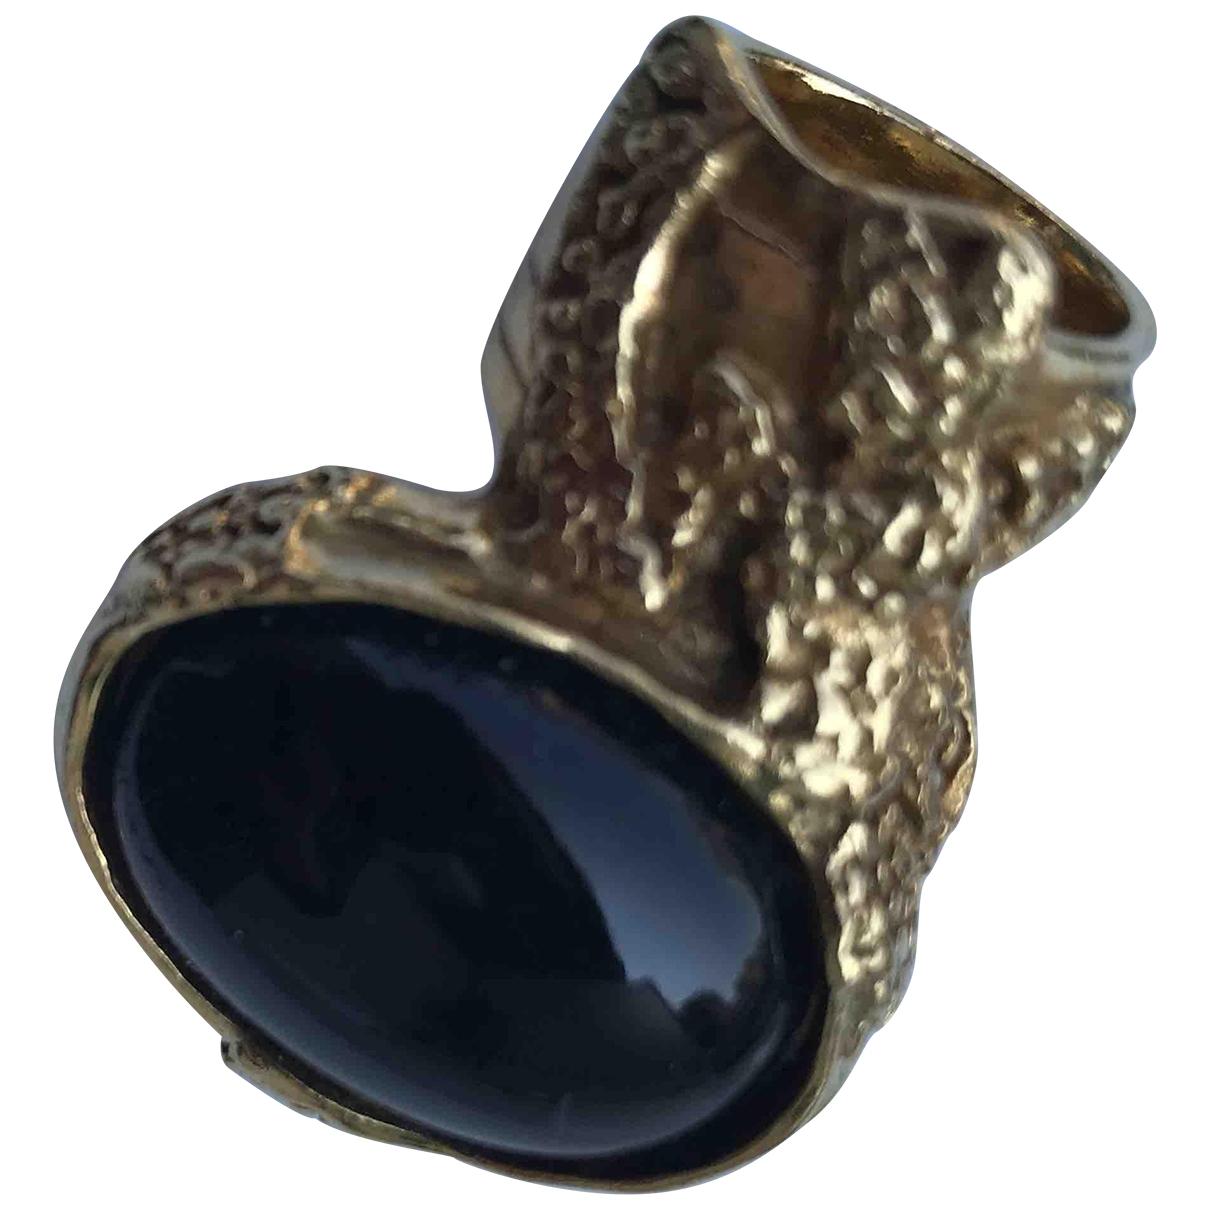 Yves Saint Laurent Arty Black Gold plated ring for Women 5 ¼ US